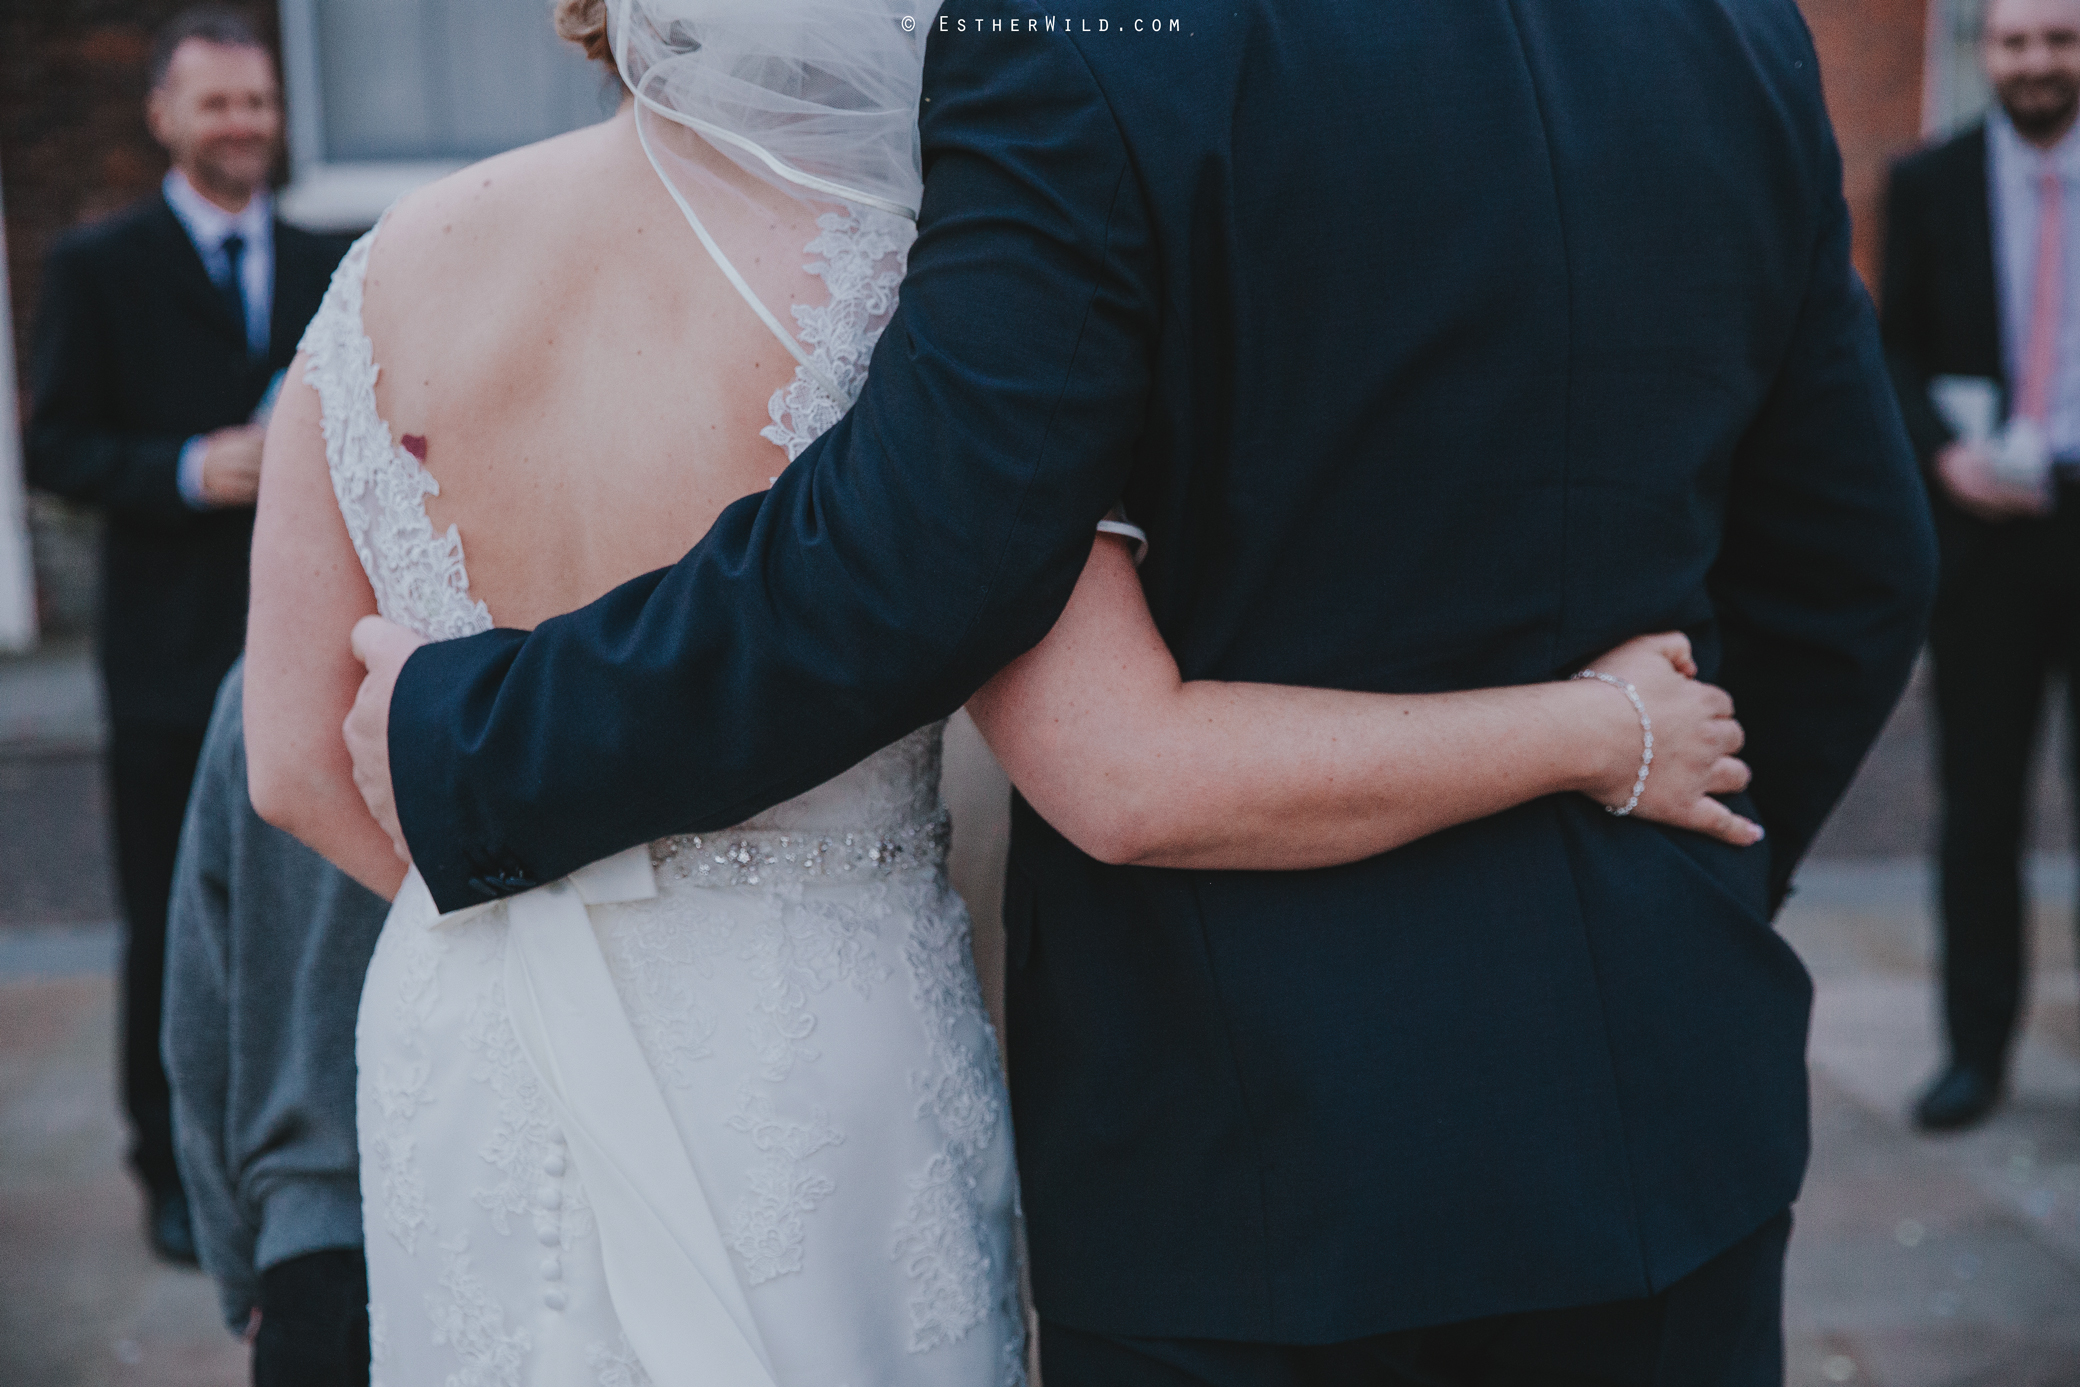 Wedding_Kings_Lynn_Town_Hall_Norfolk_Photographer_Esther_Wild_IMG_1270.jpg